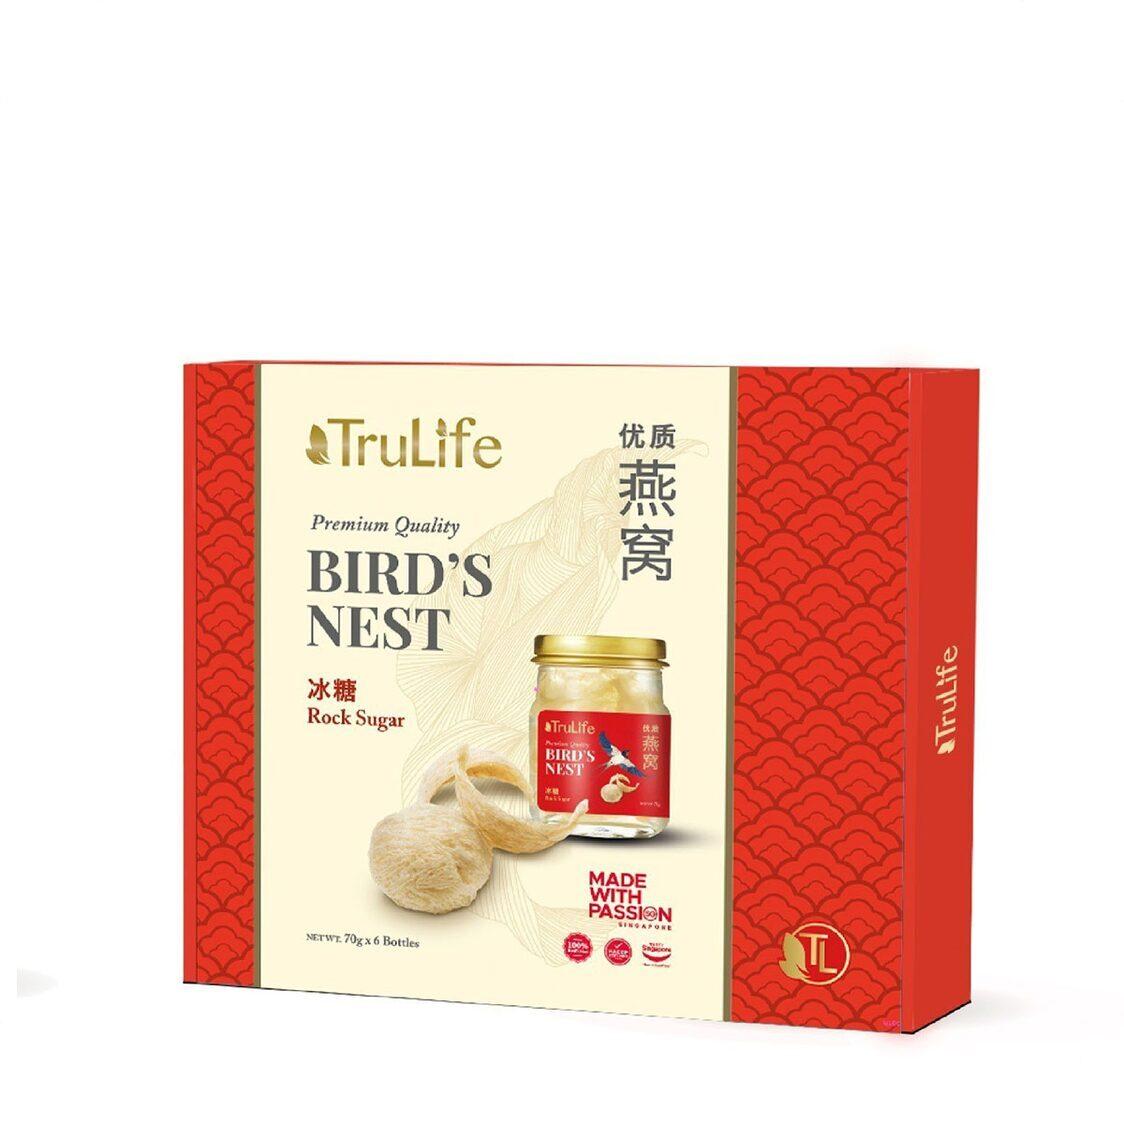 TruLife Birds Nest With Rock Sugar 70gx6